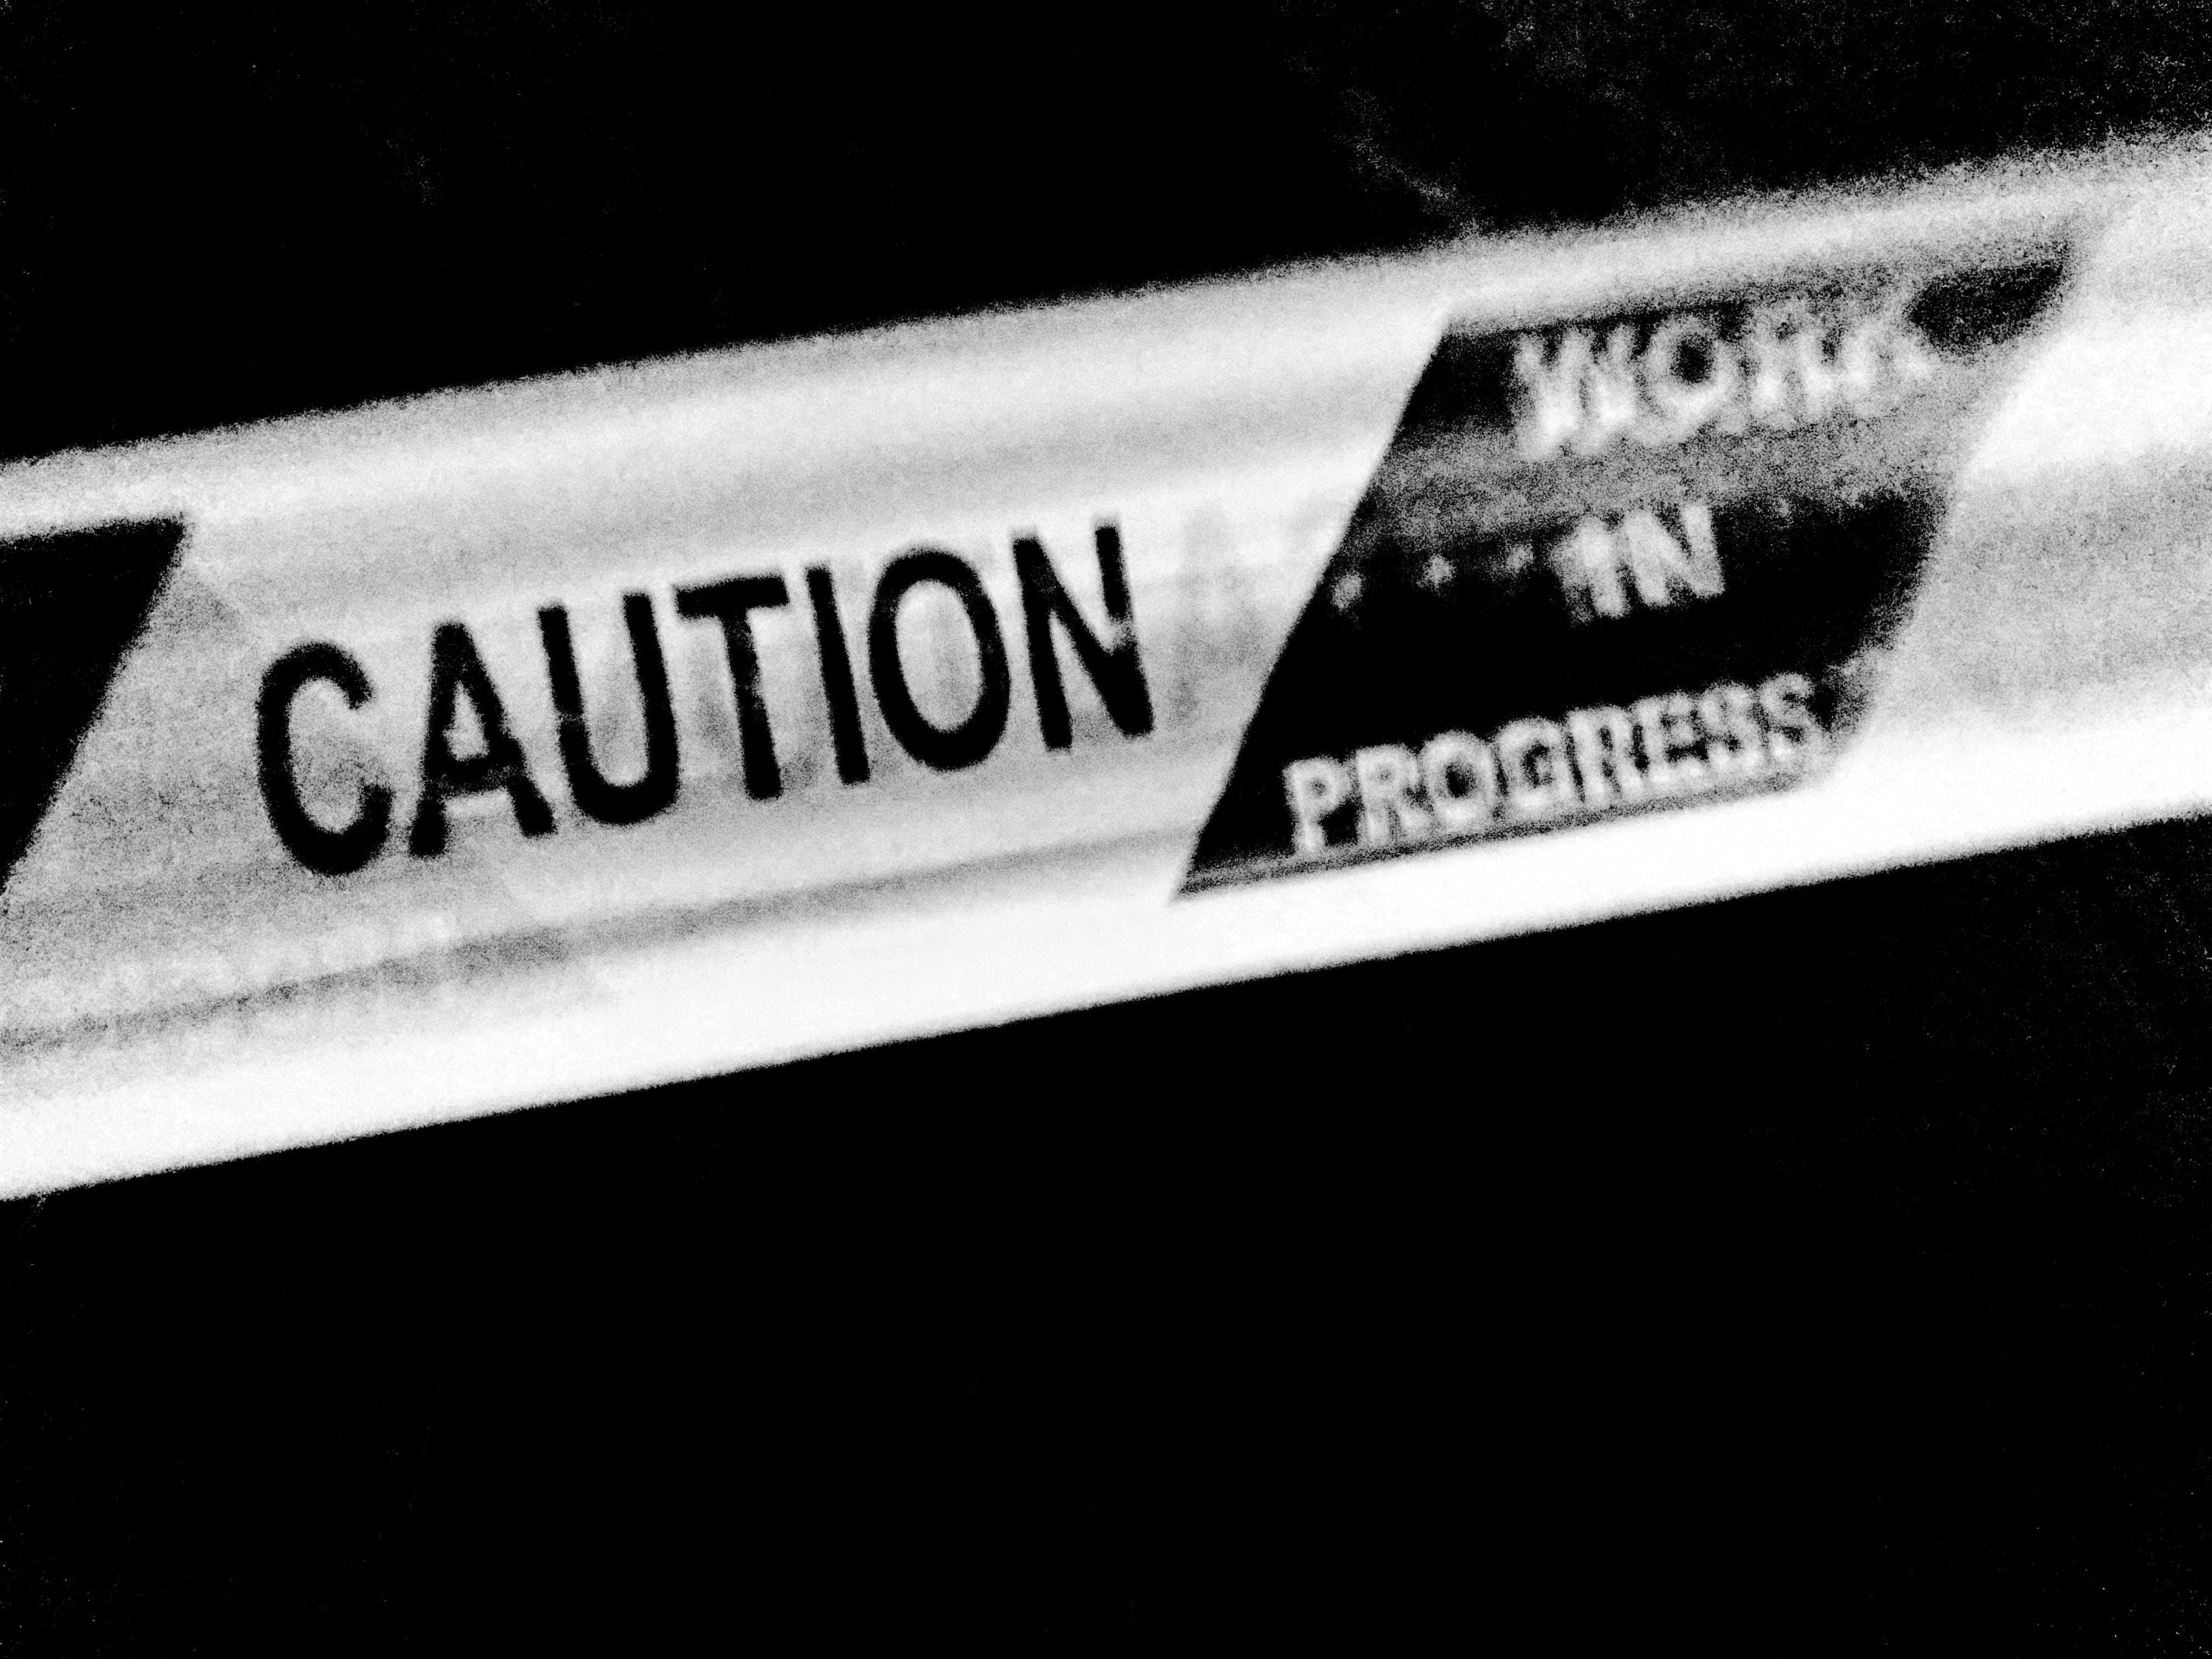 Free stock photo of Caution..